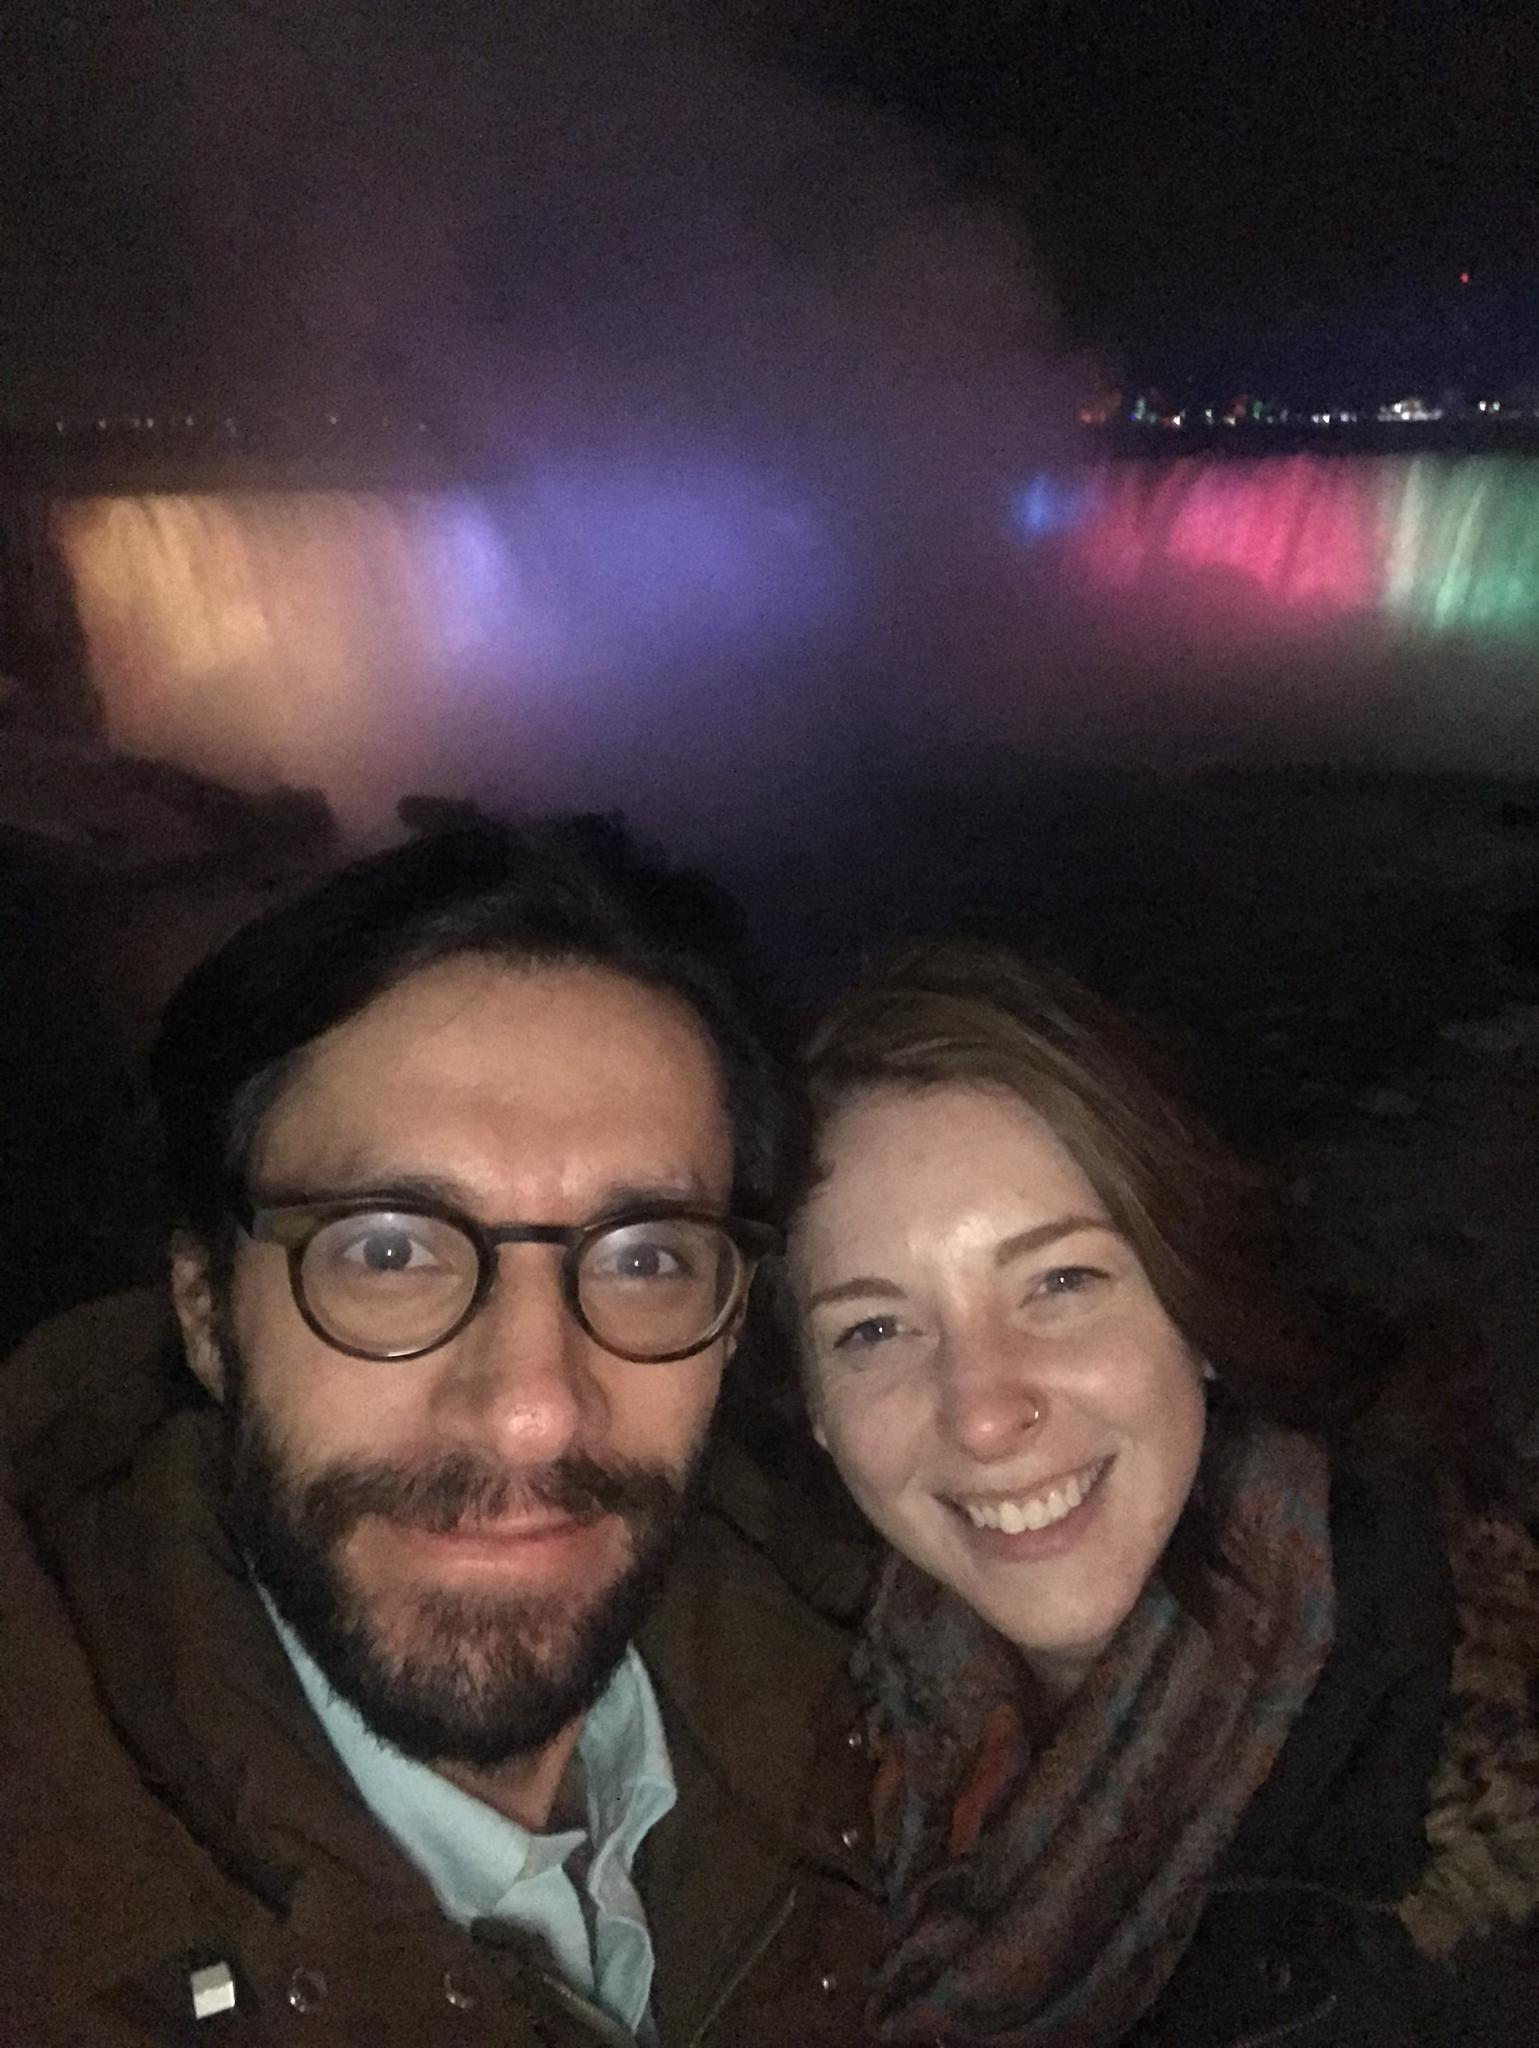 Niagara Falls December 2018